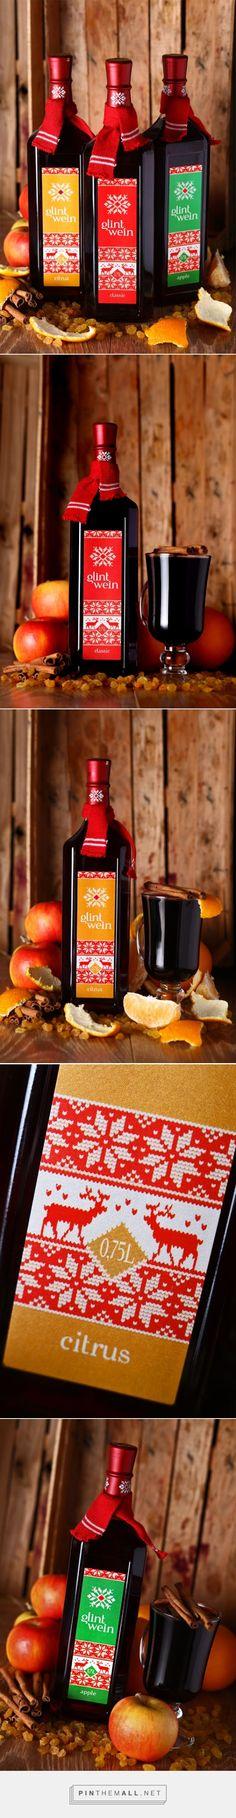 Glintwein - traditional mulled wine